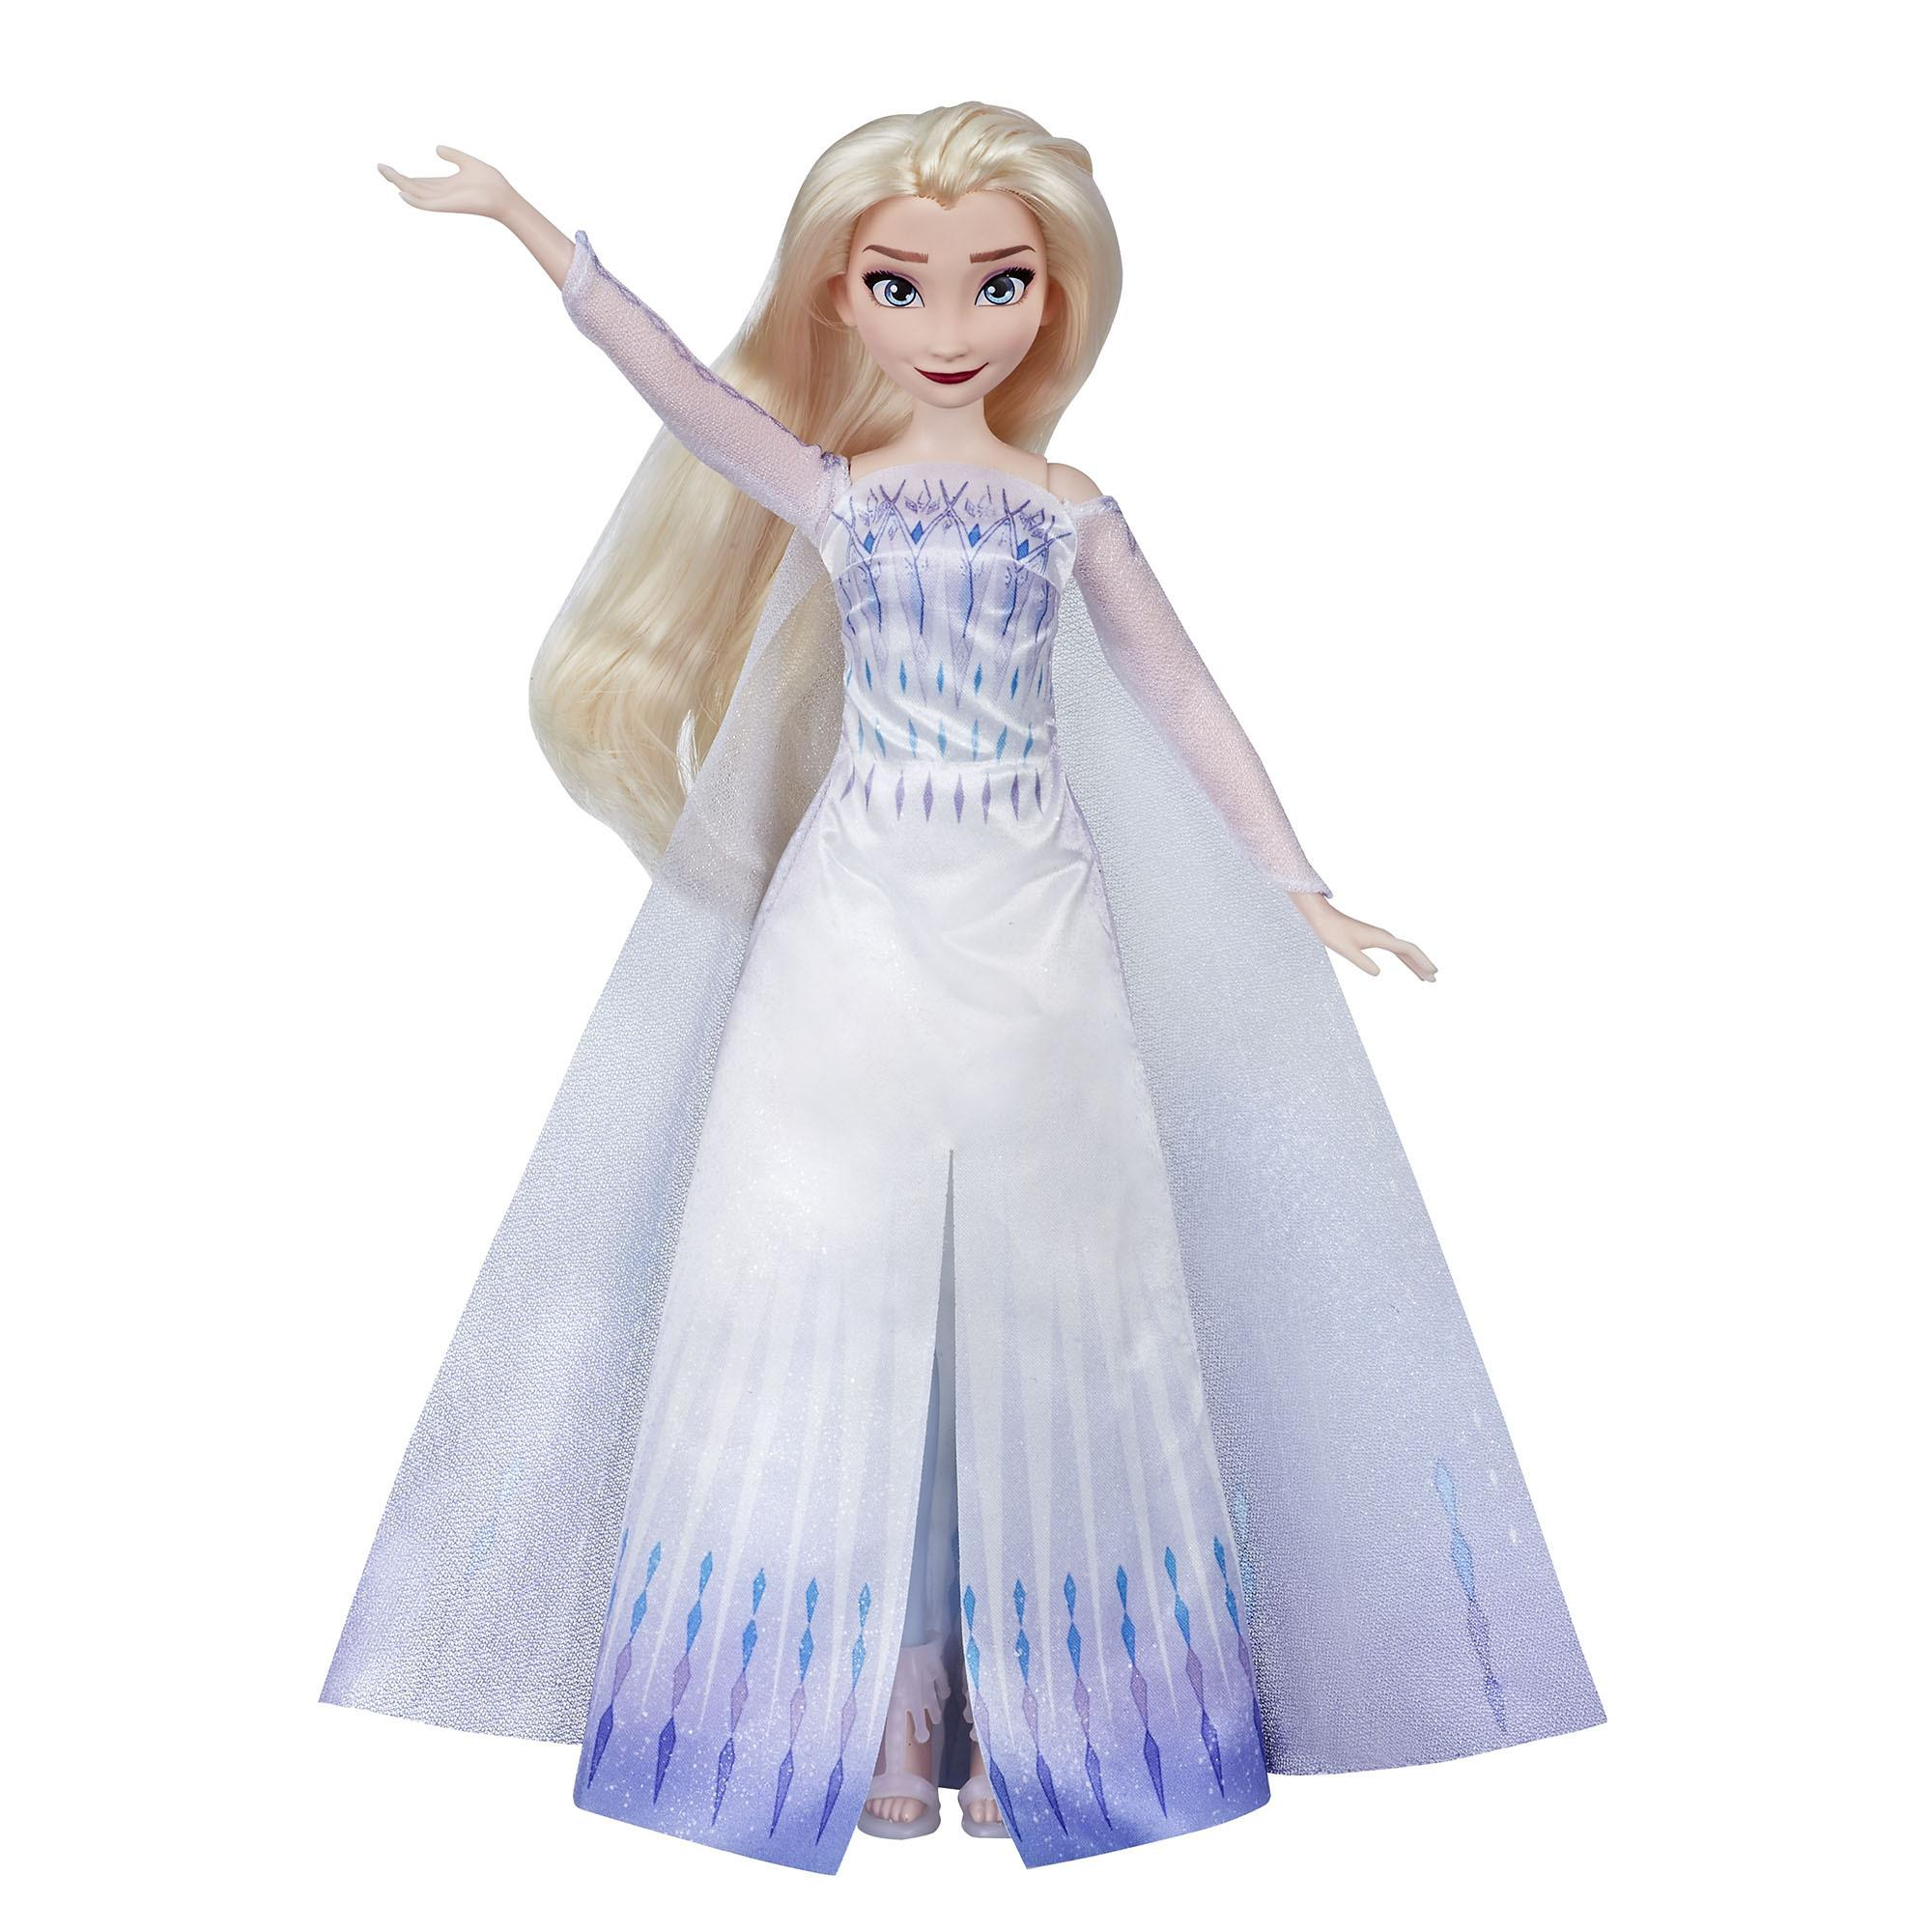 Disney Frozen Elsa Aventura musical - Muñeca que canta la canción